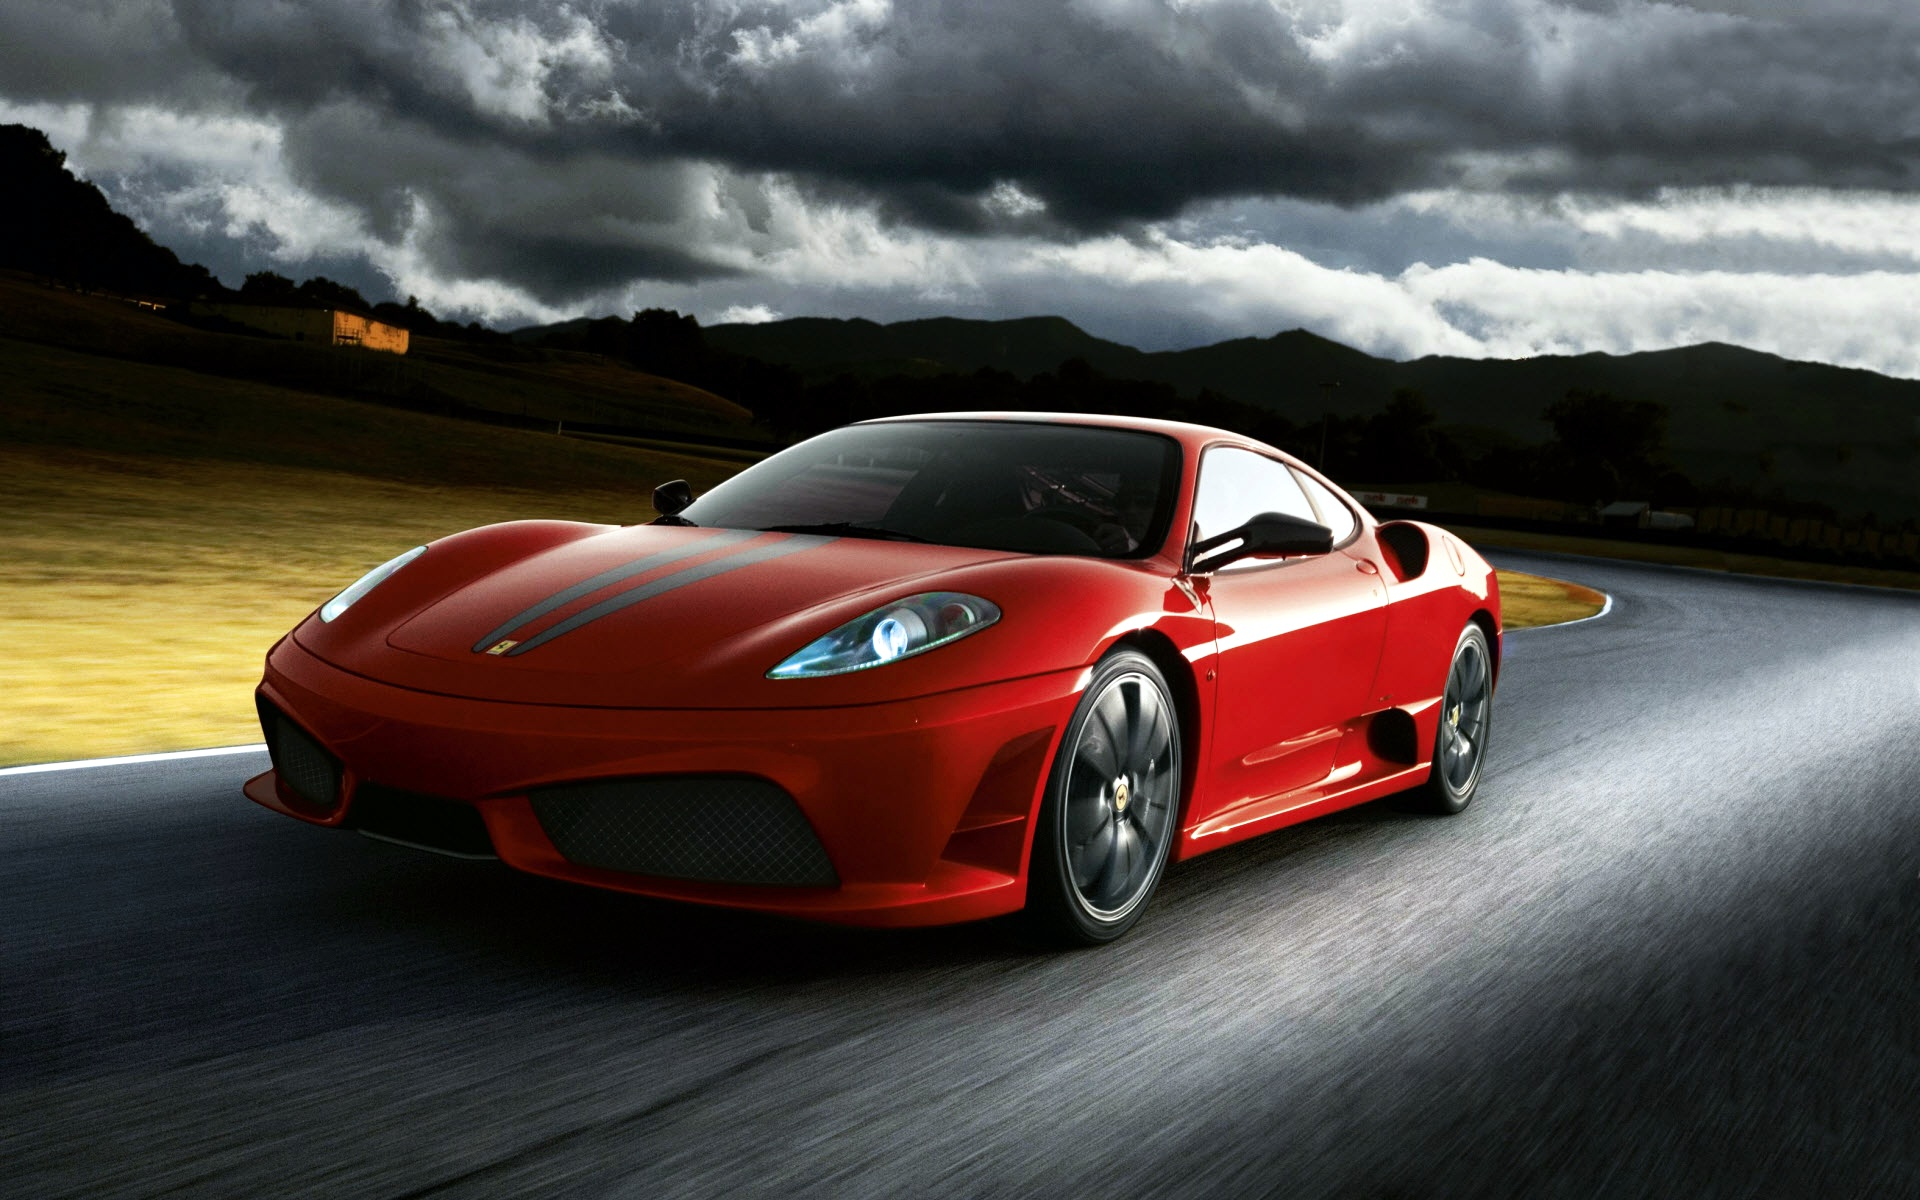 Fondos De Vehiculos: Ferrari Full HD Fondo De Pantalla And Fondo De Escritorio